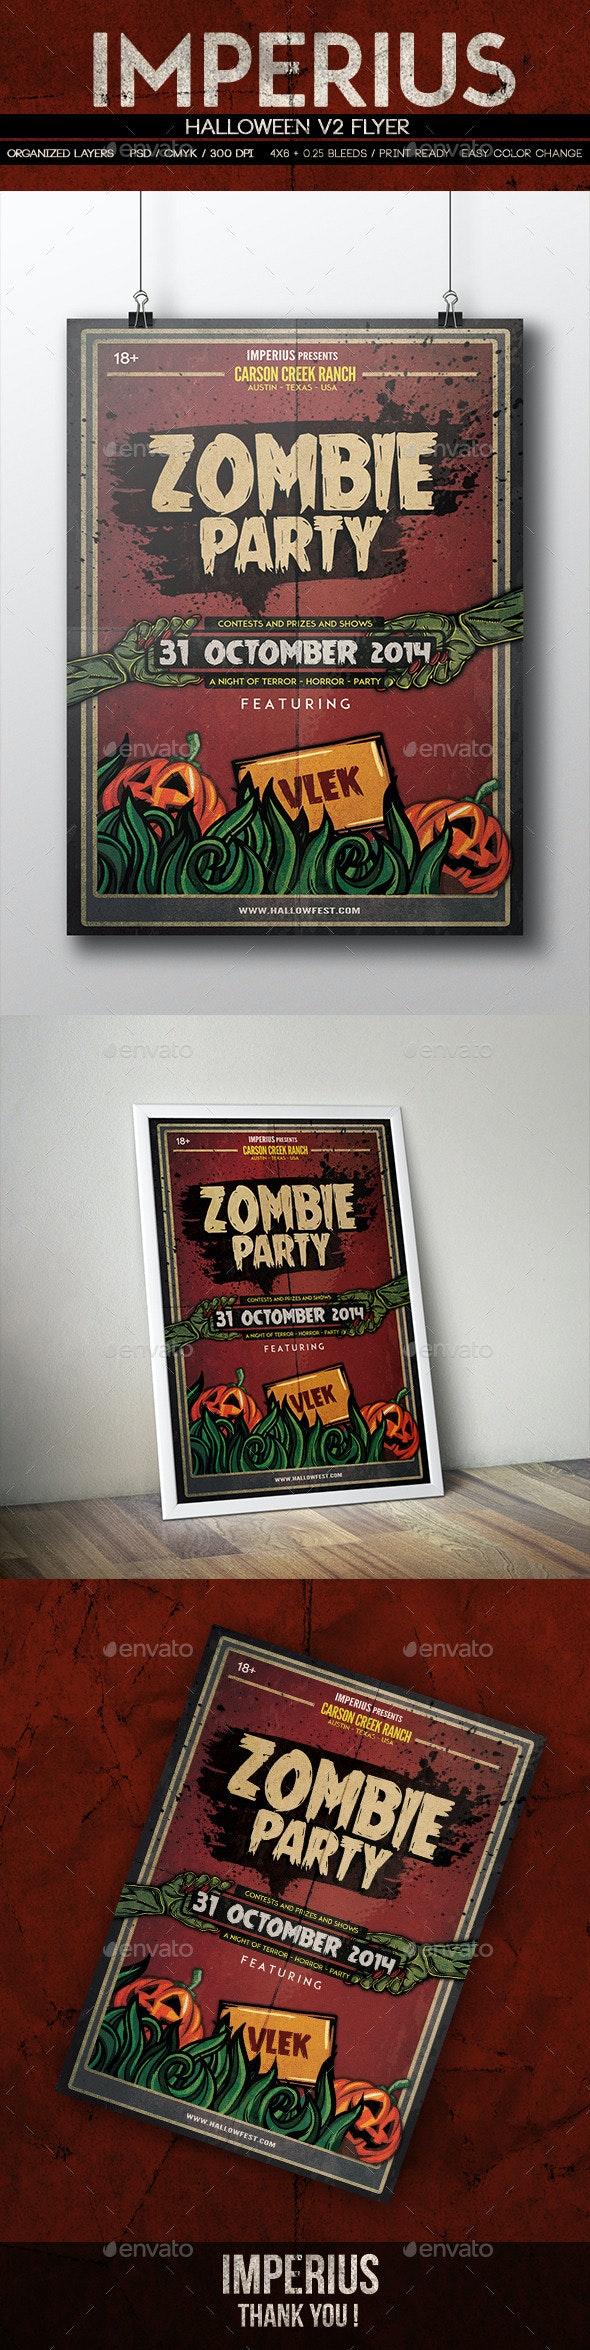 Halloween V2 Flyer - Events Flyers